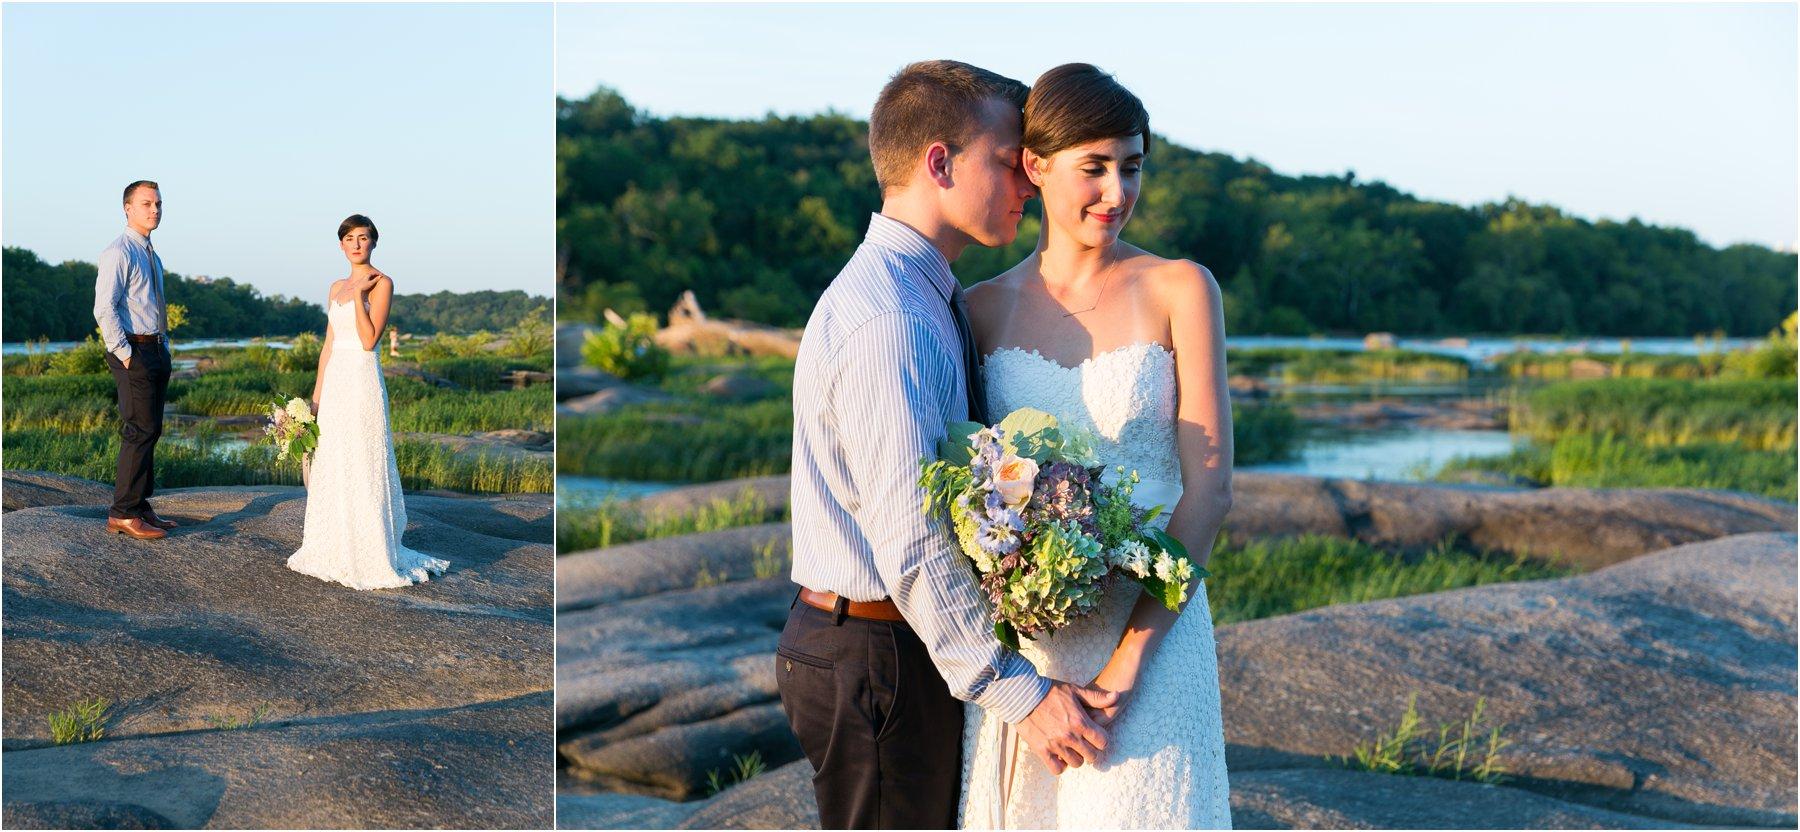 richmond_ wedding_belle_isle_Jessica_ryan_photography_0061